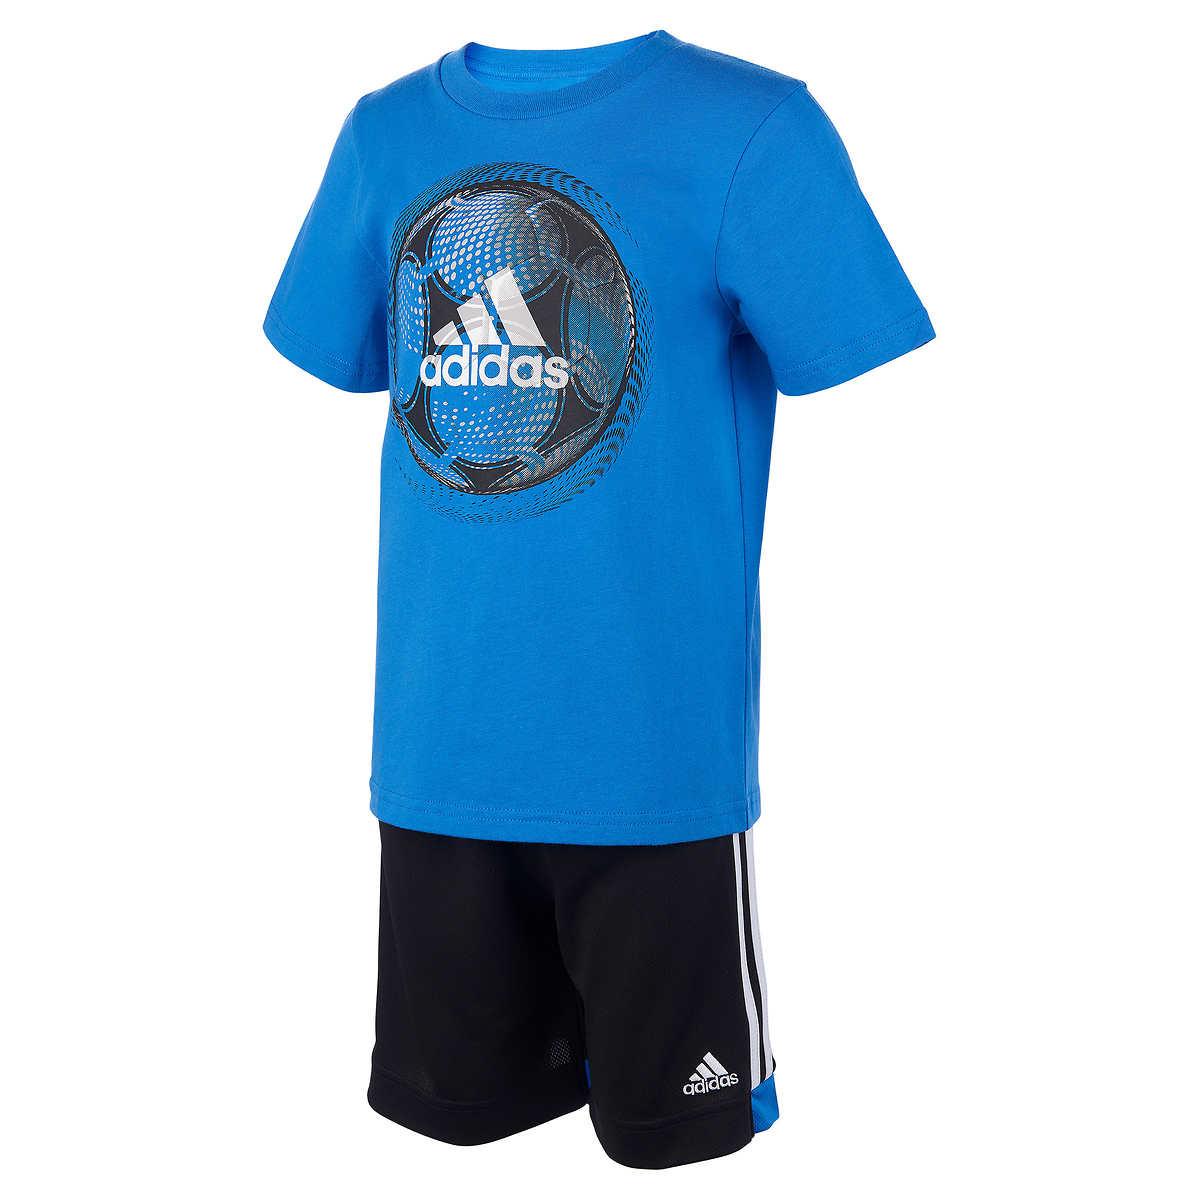 b513cfbd50e1 Adidas Youth 2-piece Short Set